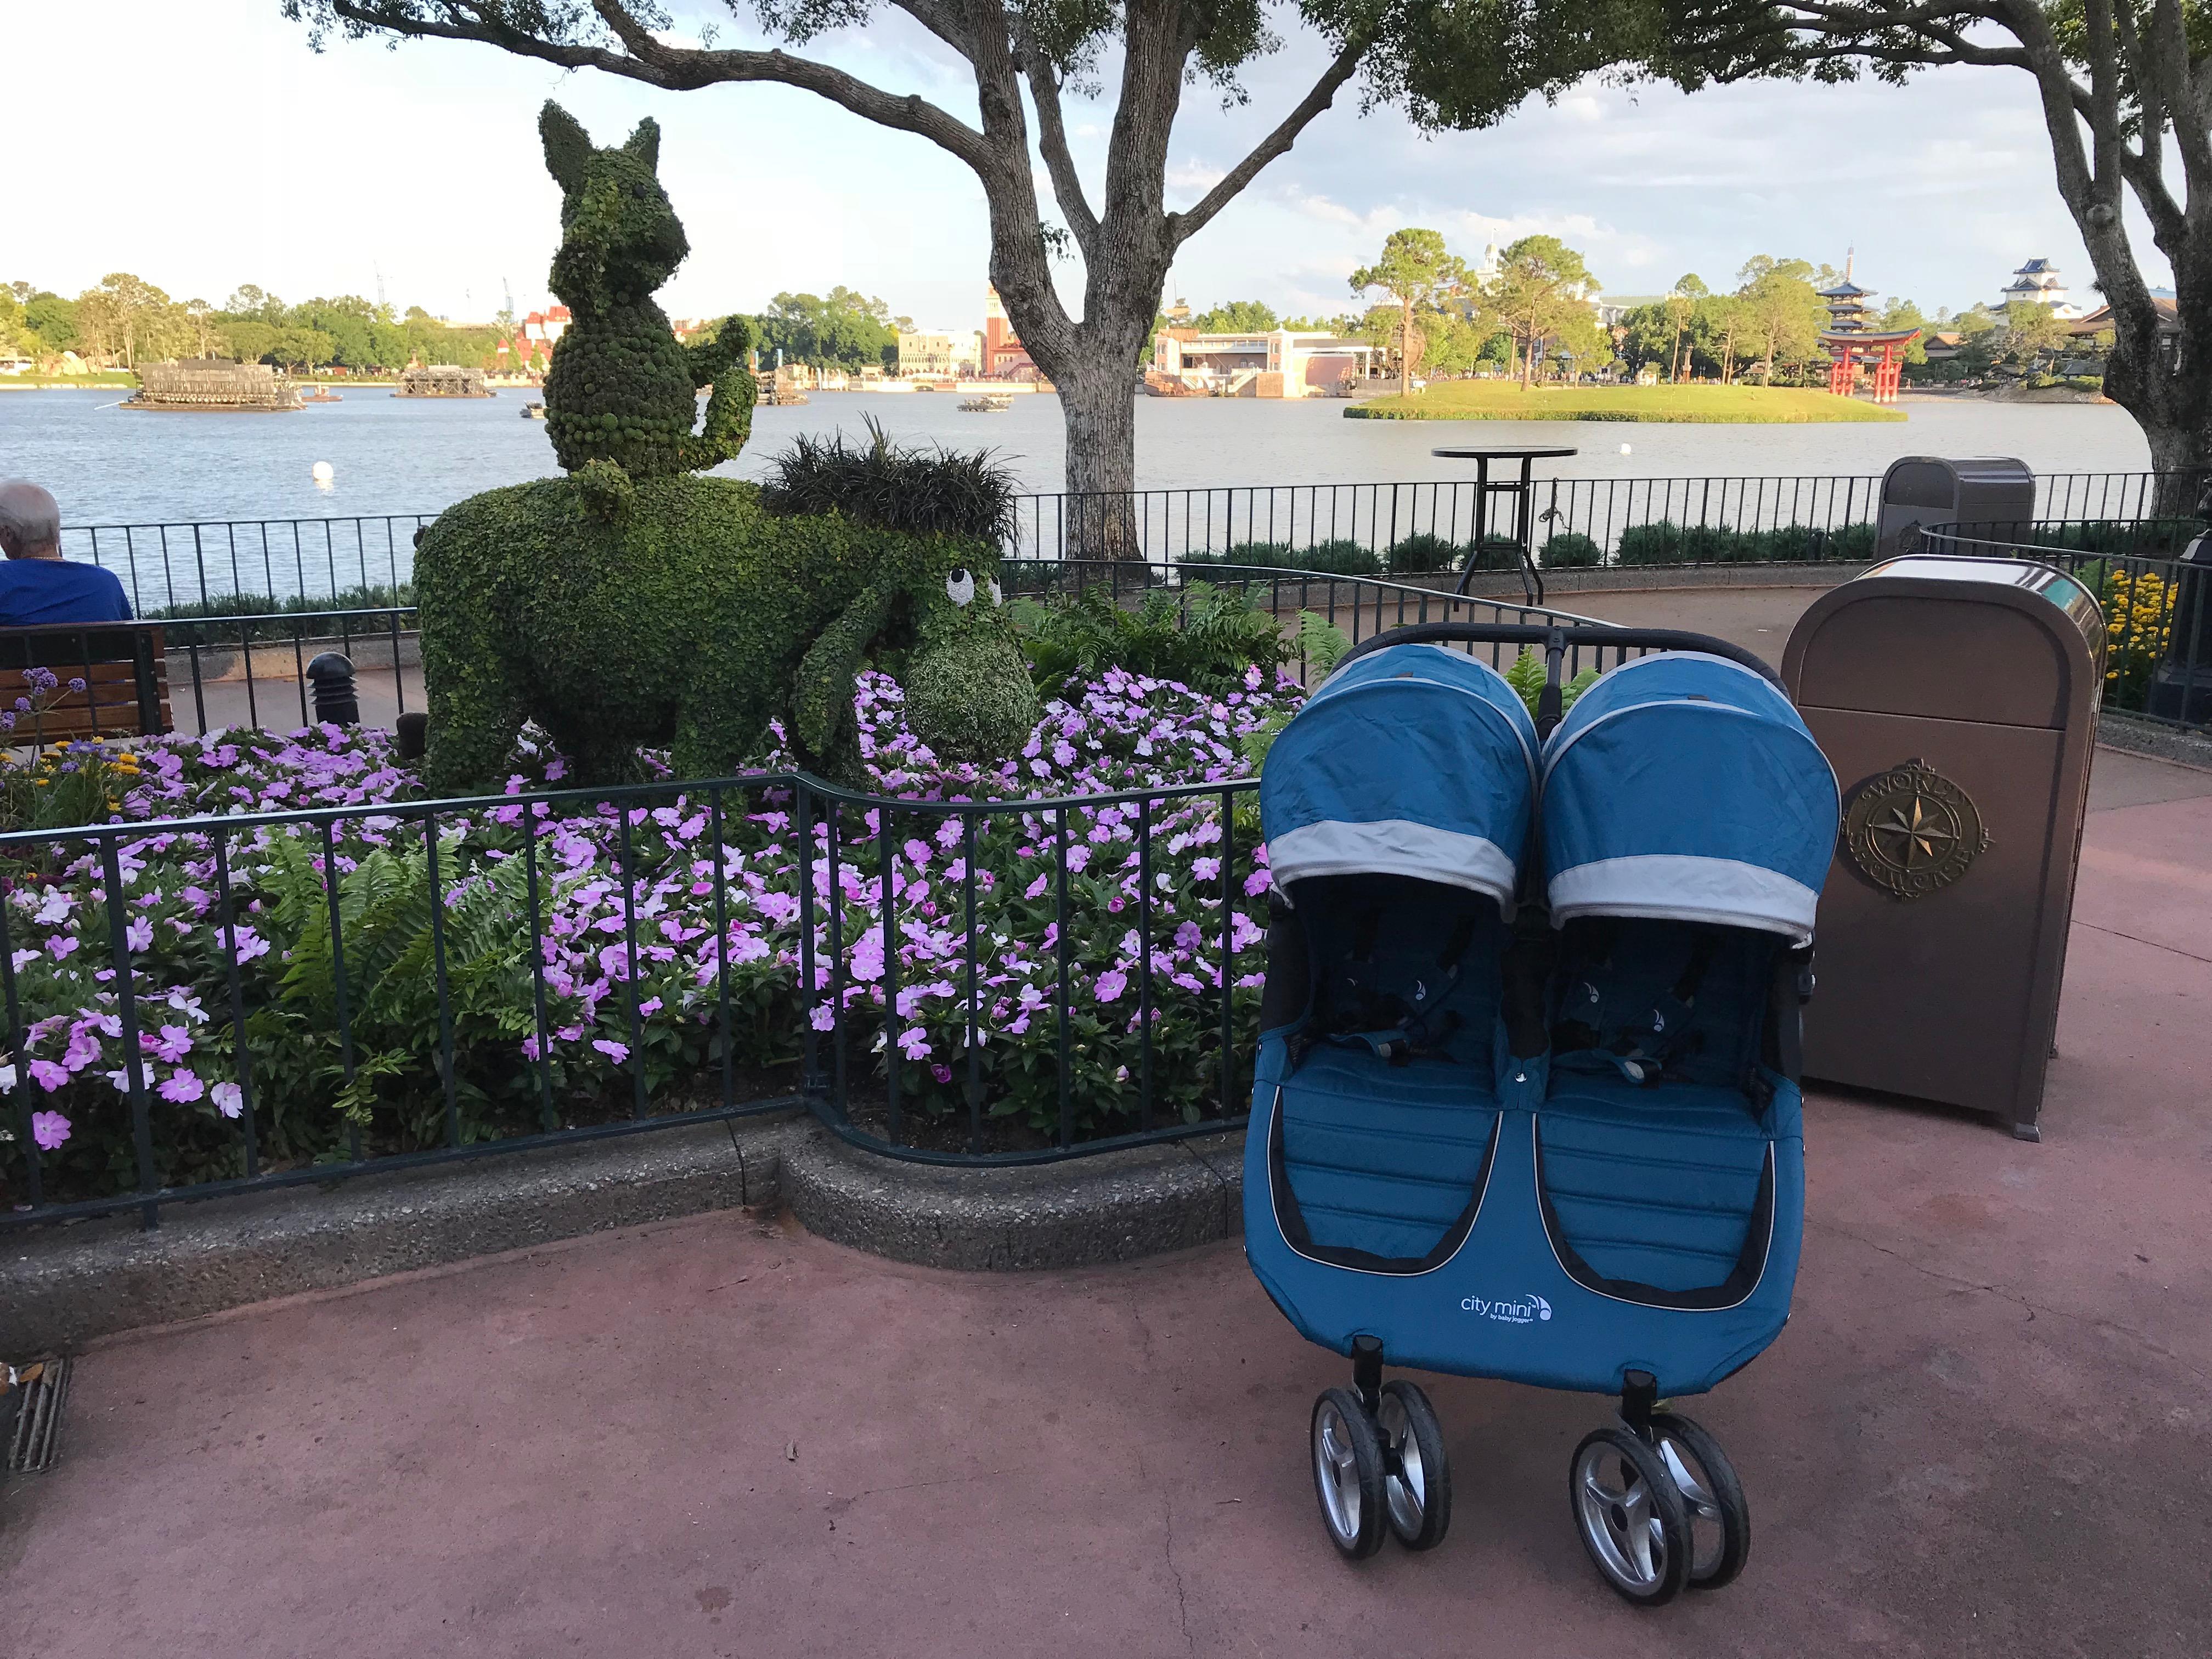 Stroller Rentals Disney image 52